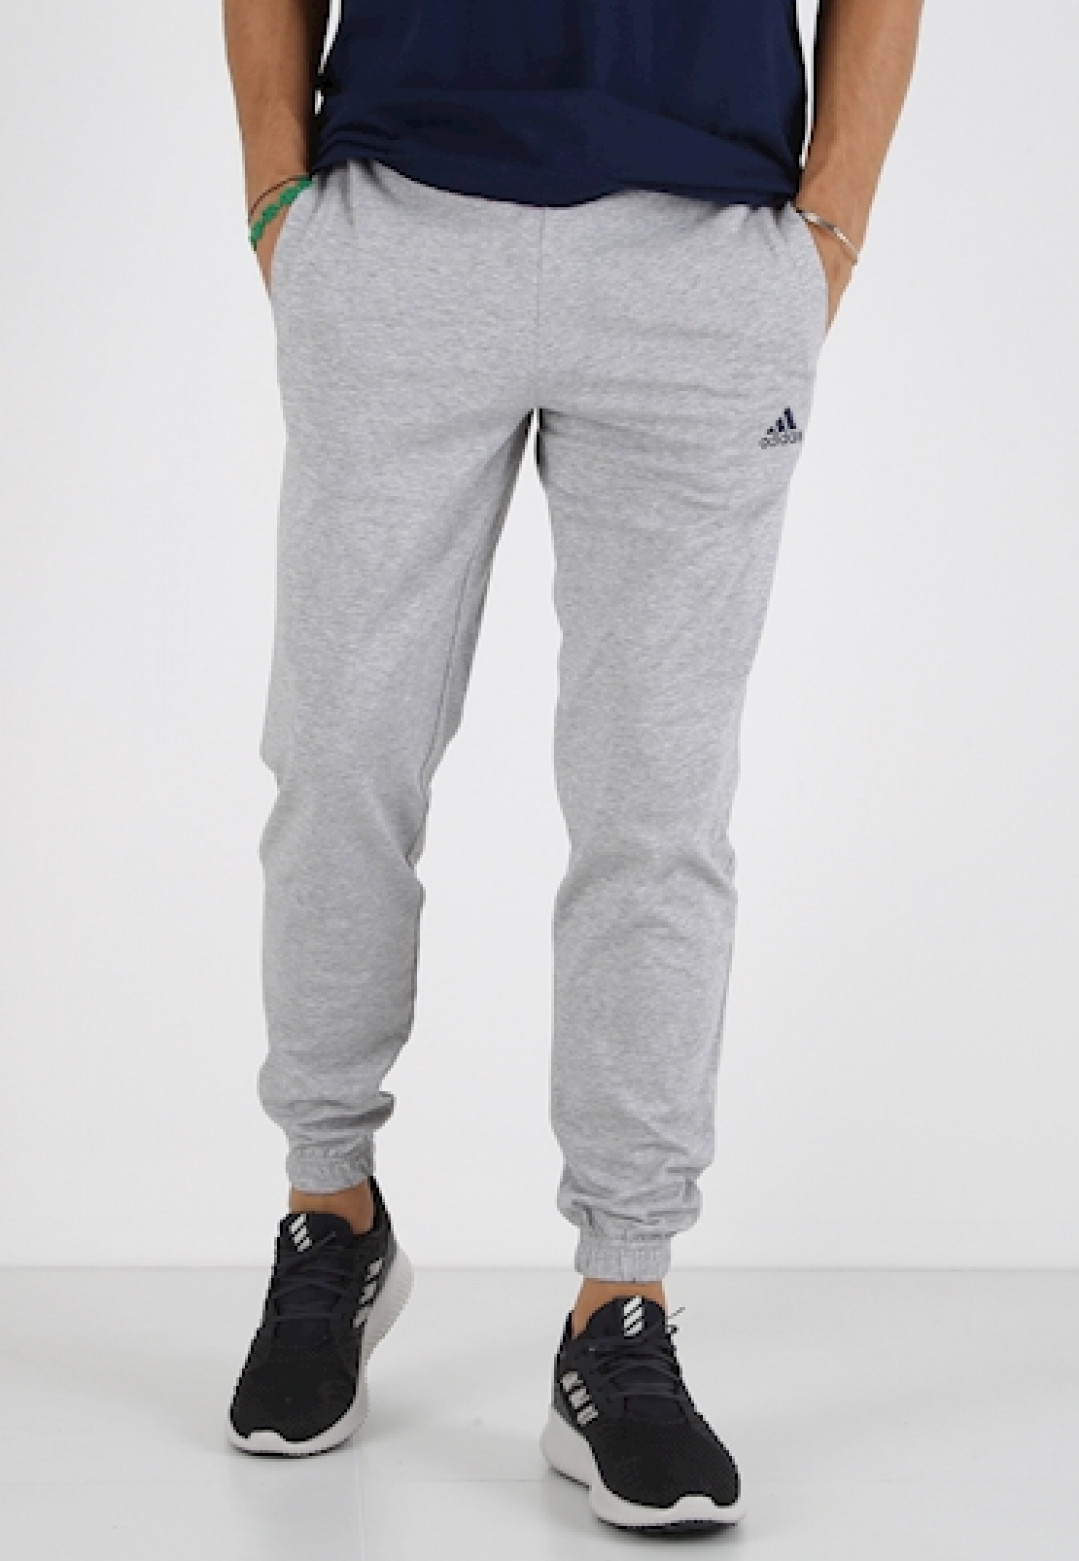 pantaloni adidas 18 tt